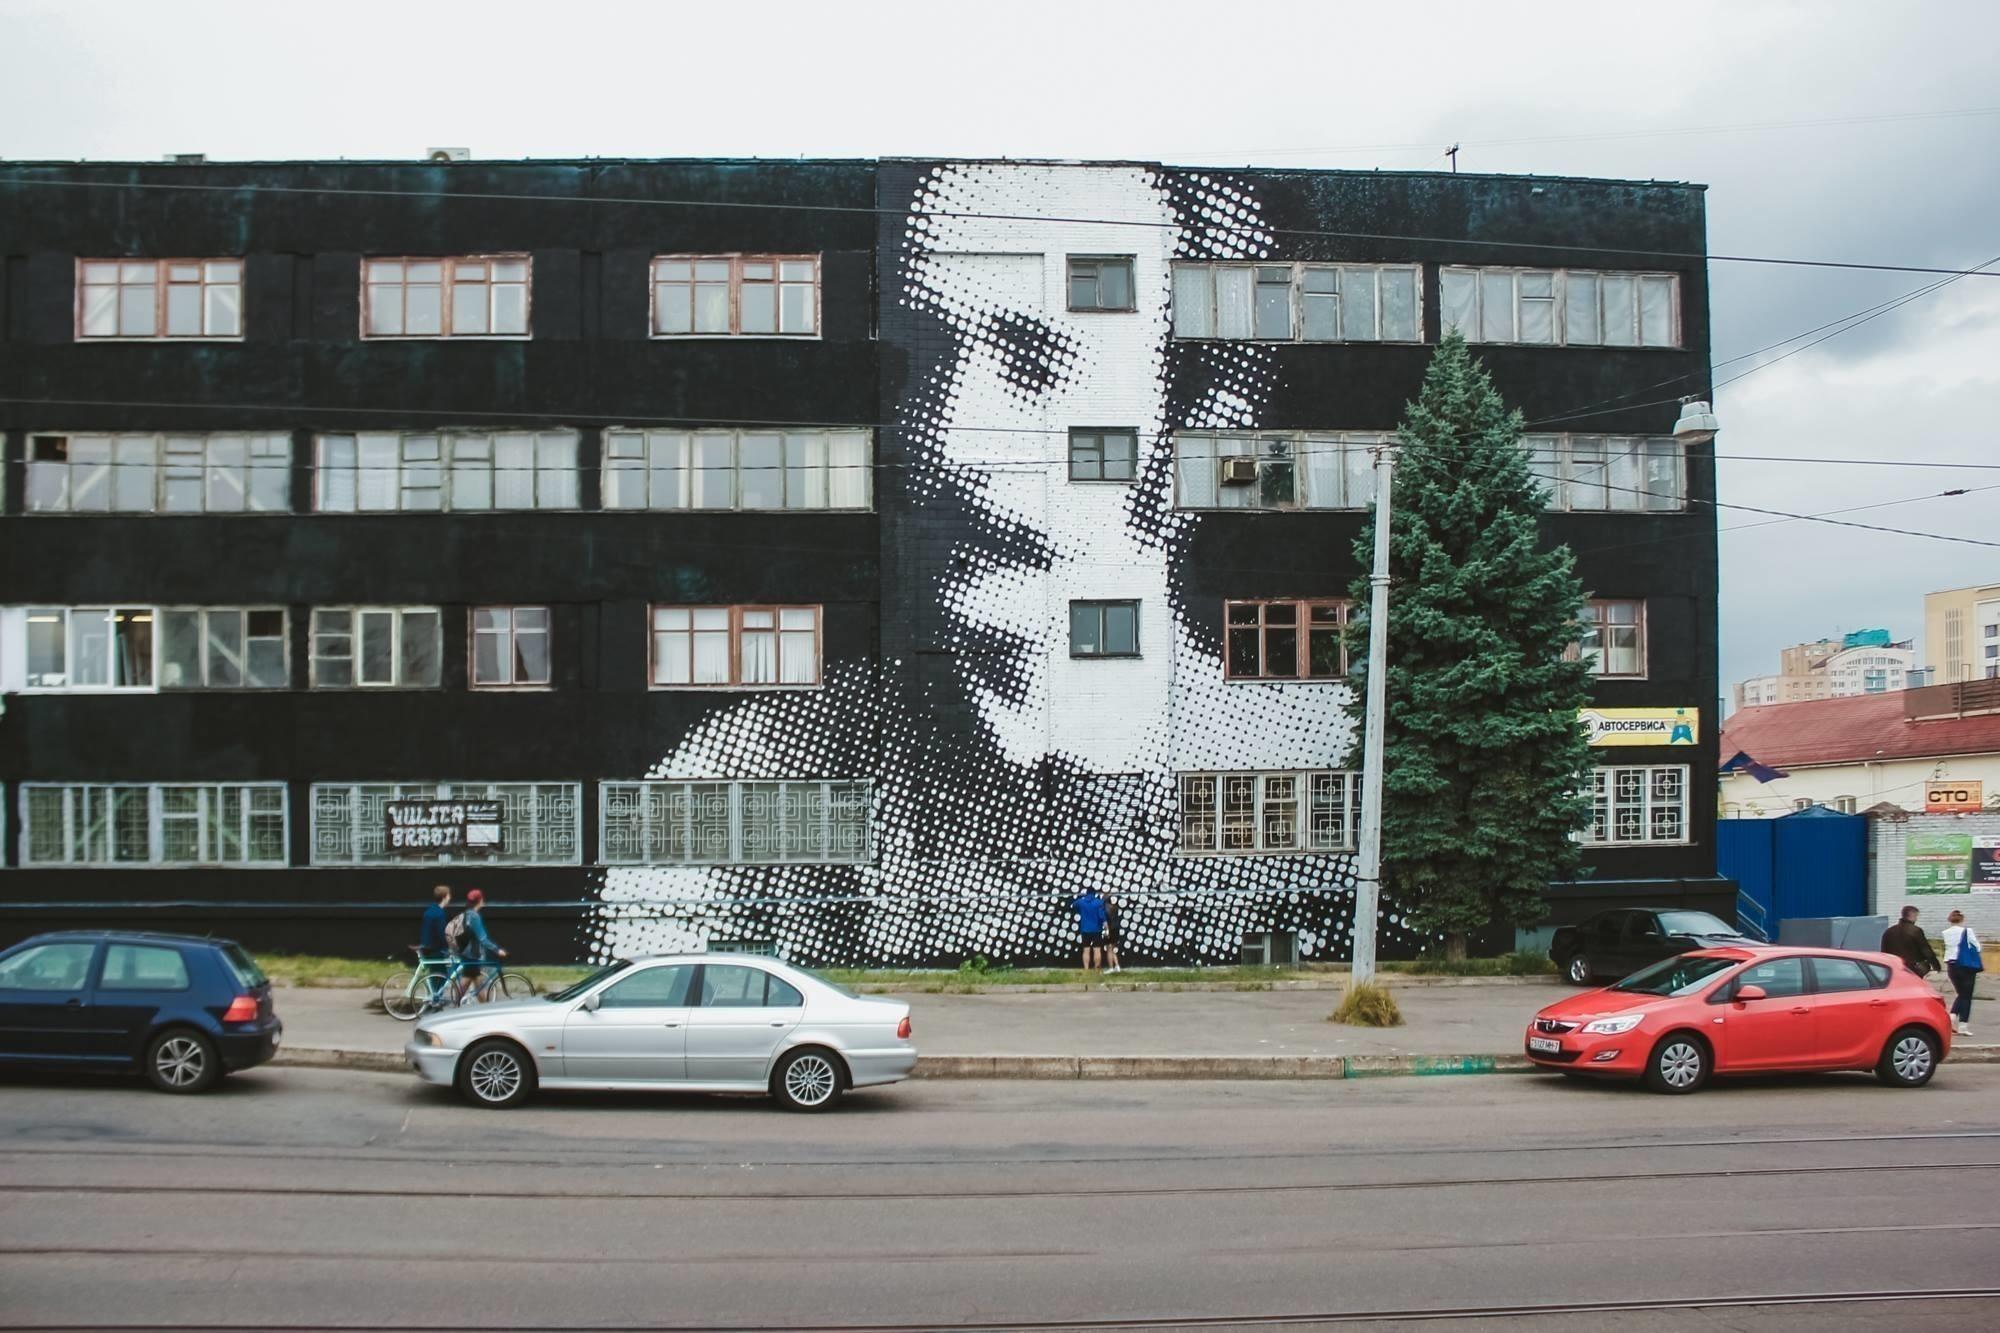 Граффити-портрет графа Чапского, фото: Анастасия Рогатко